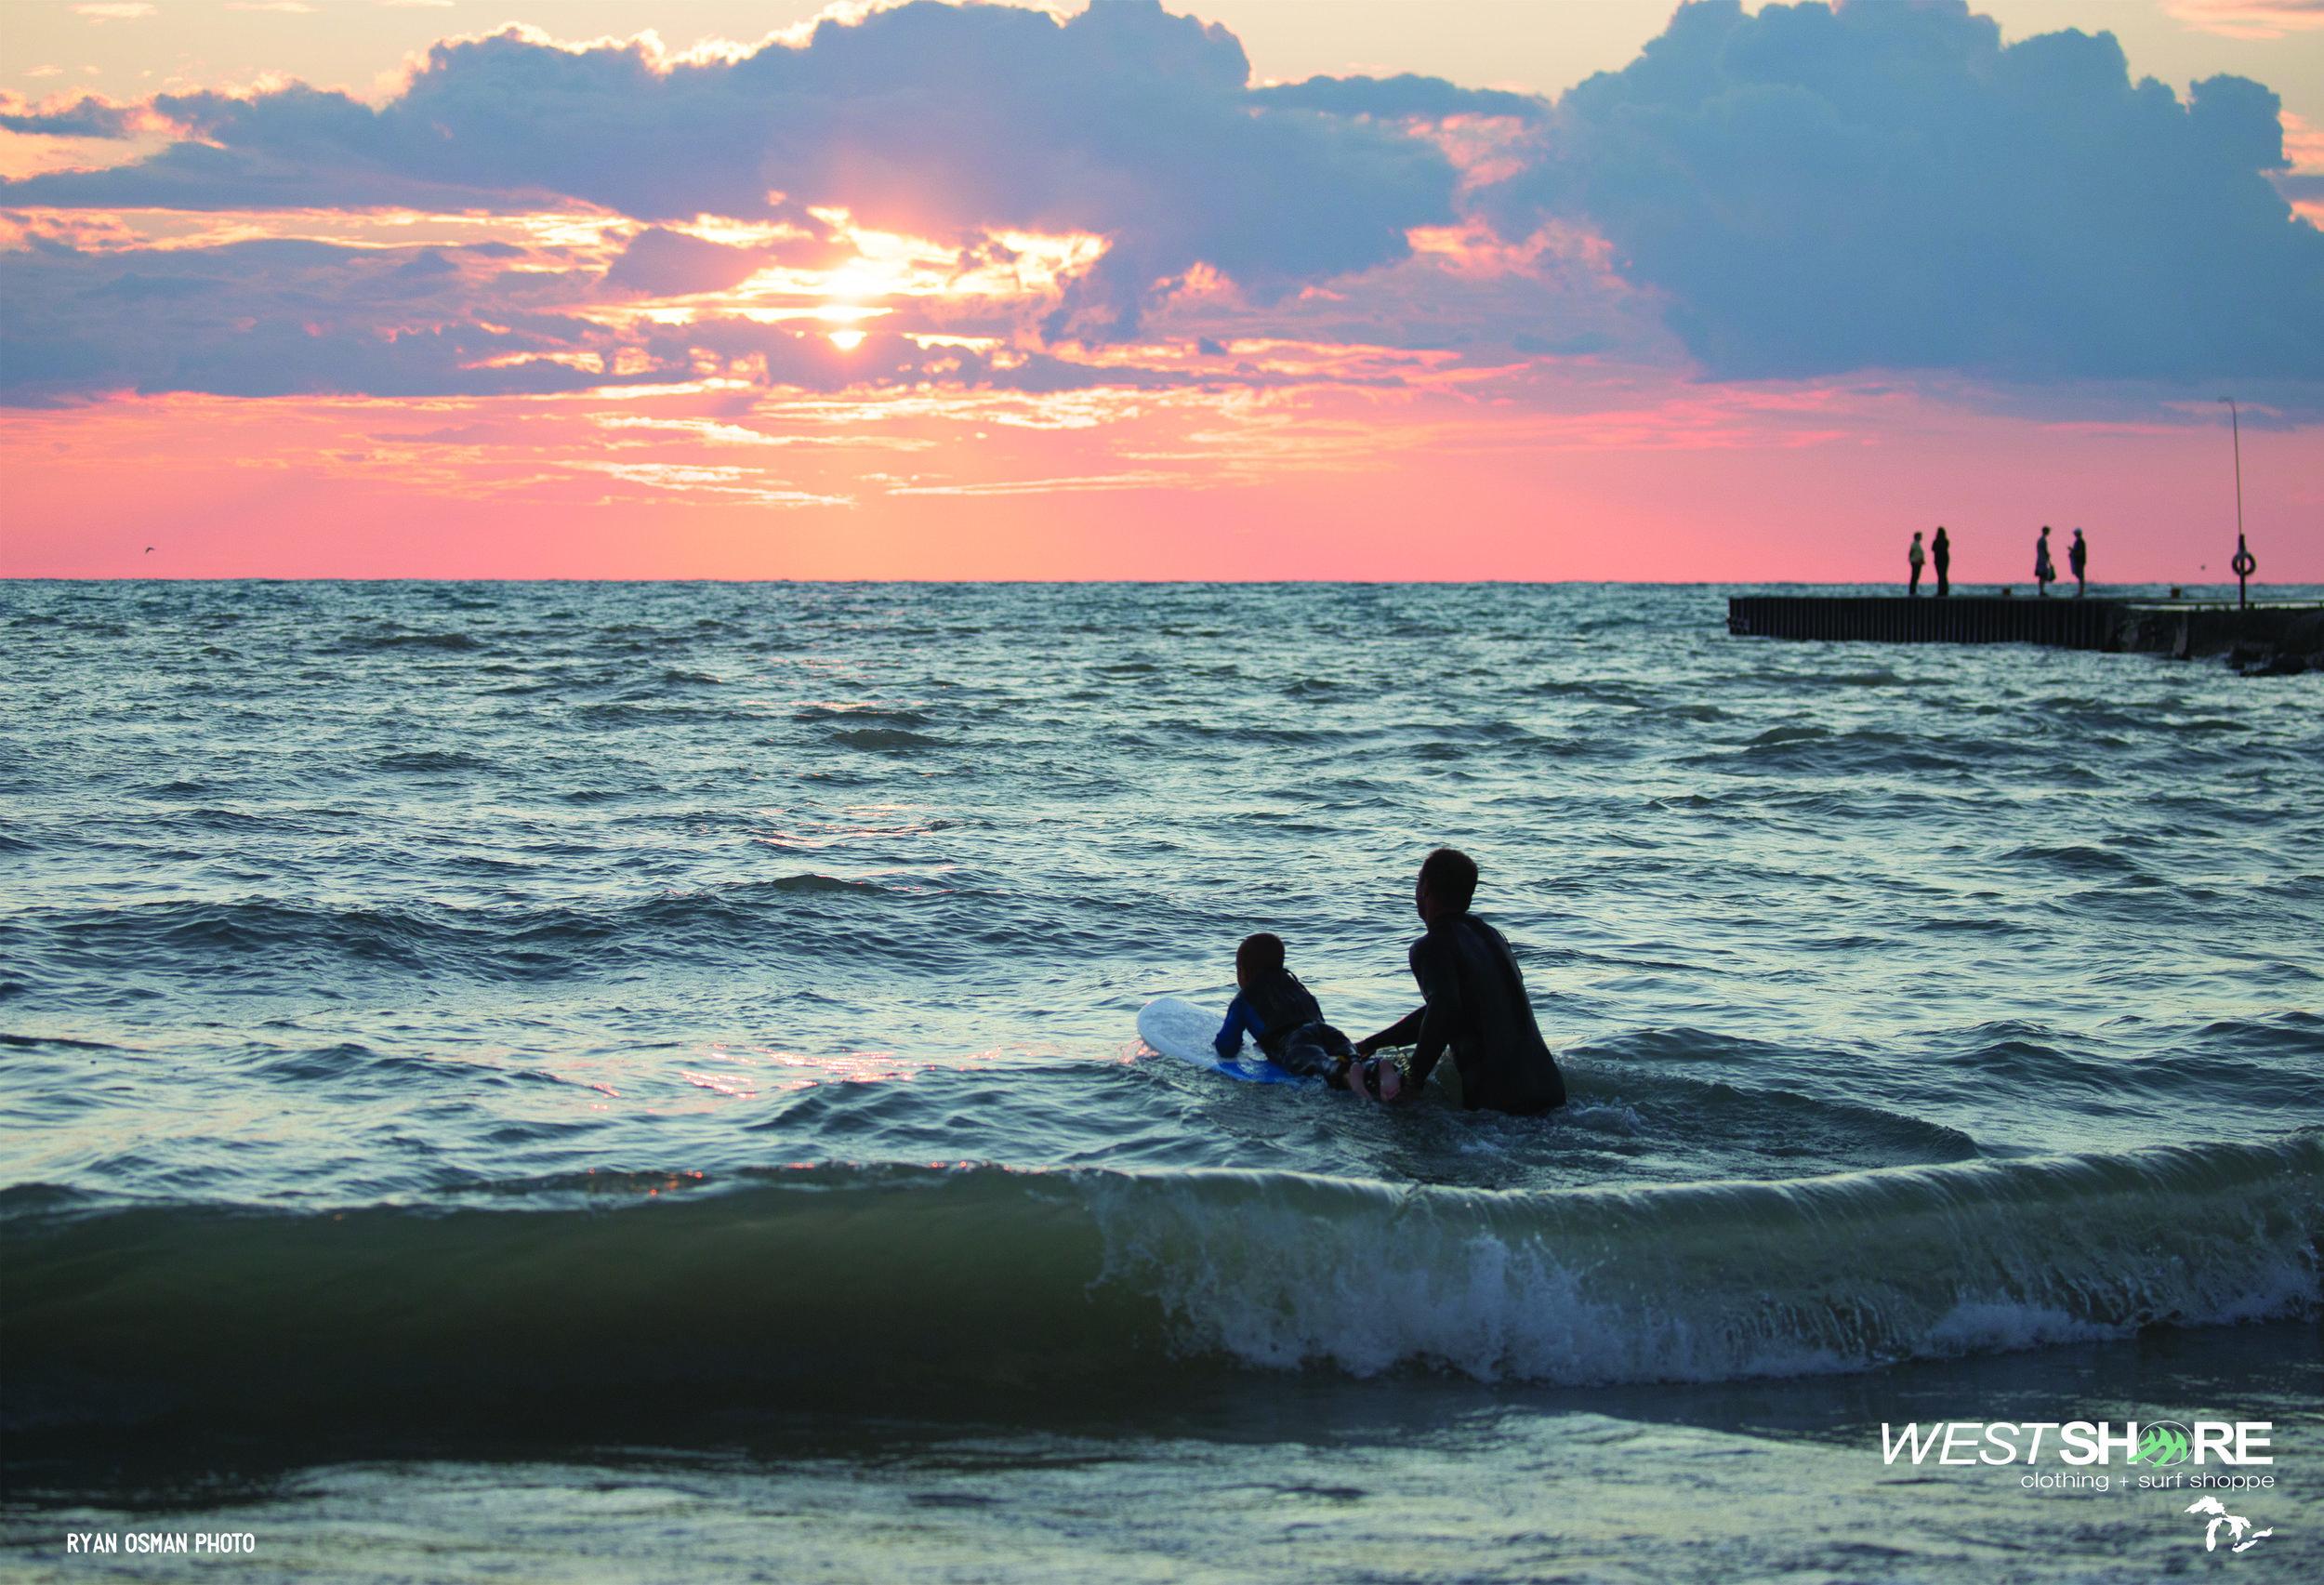 ASH TY SURFING SUNSET.jpg